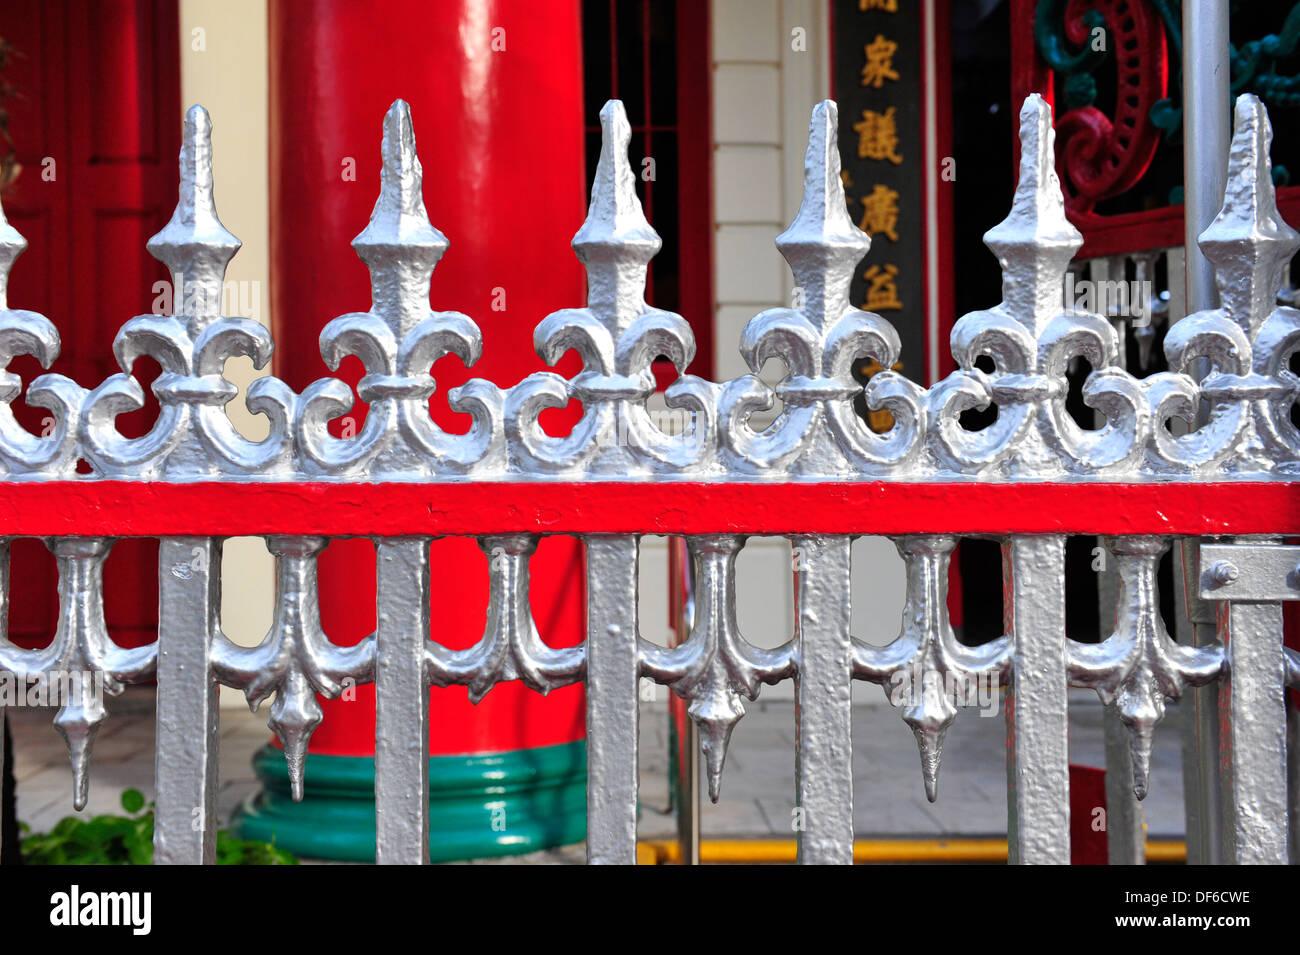 Old wrought iron fences - Stock Image